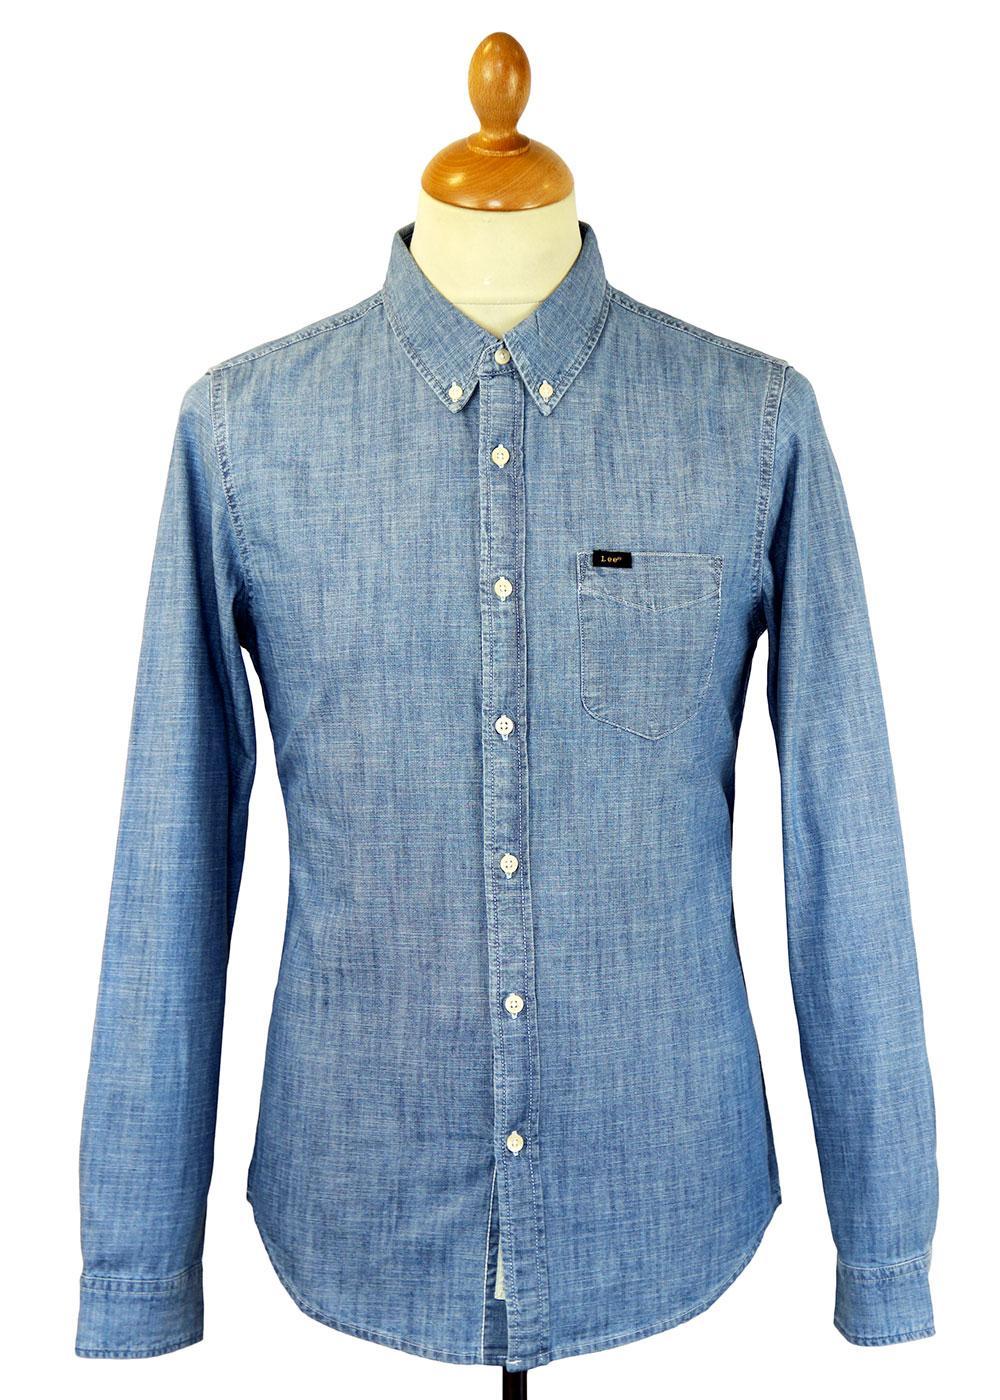 LEE Jeans Retro Mod Chambray Button Down Shirt BB